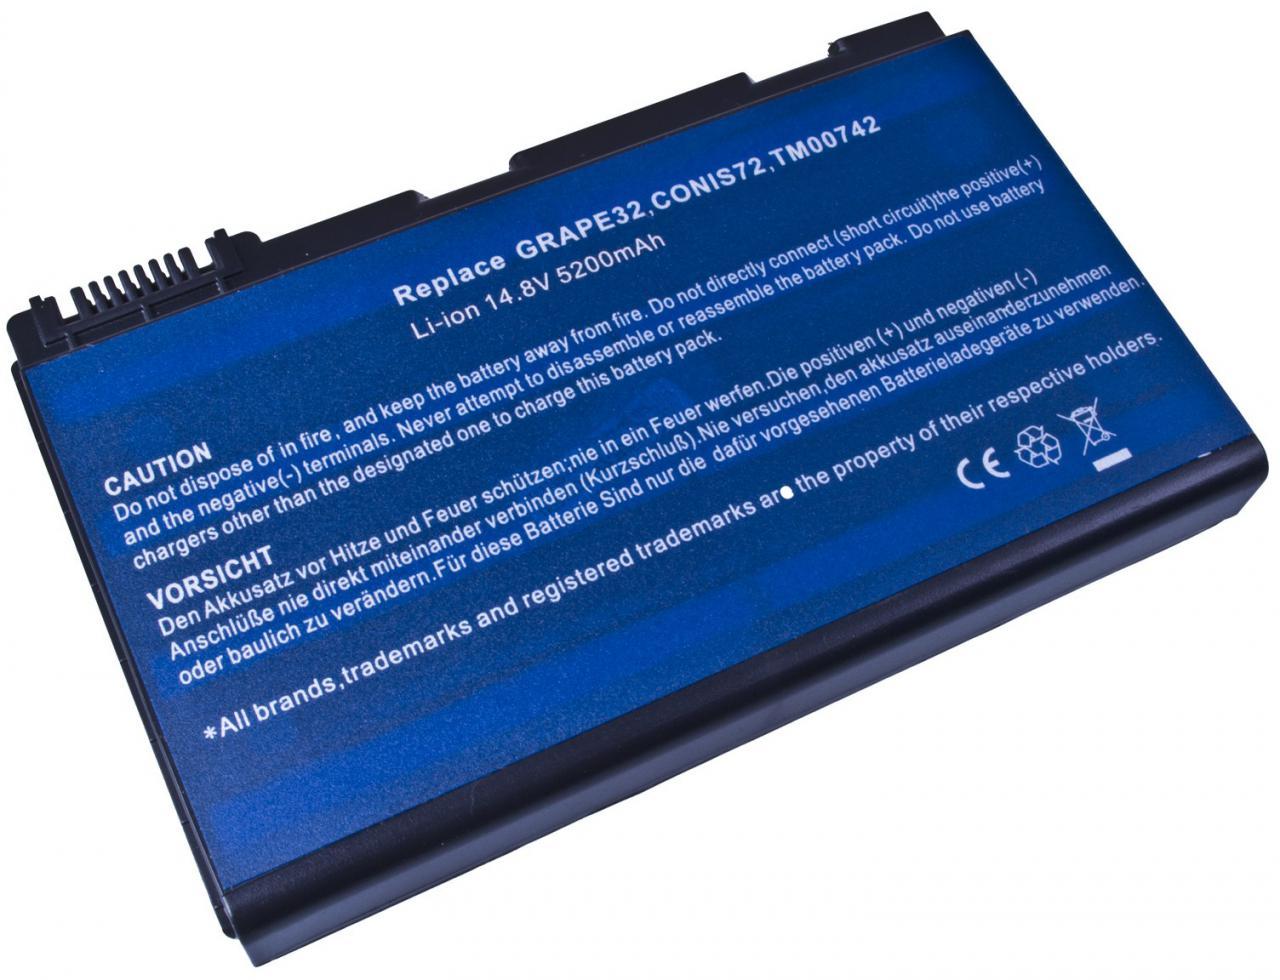 AVACOM Baterie AVACOM NOAC-TM53-806 pro Acer TravelMate 5310/5720, Extensa 5220/5620 Li-Ion 14,8V (NOAC-TM53-806)